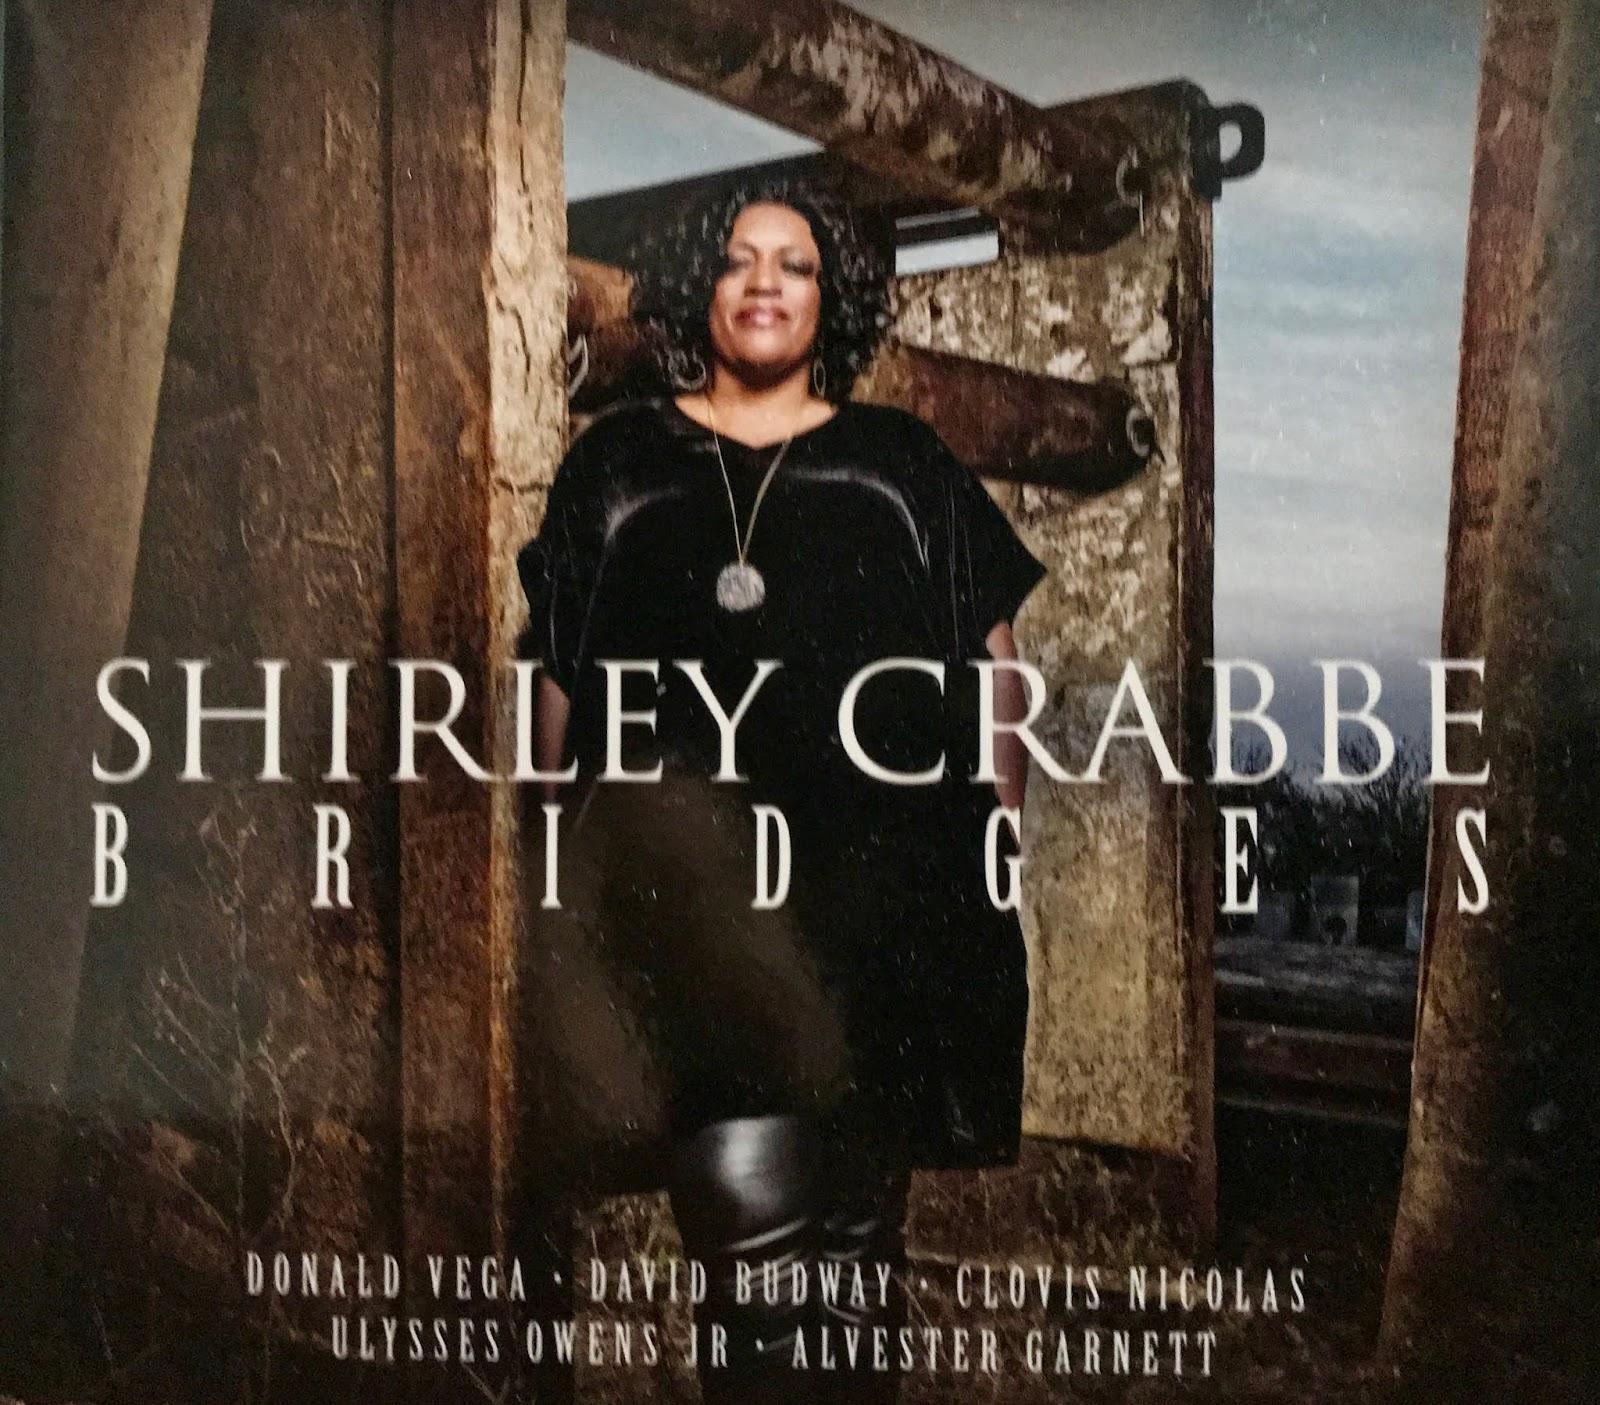 Music Man Blog Cd Review Shirley Crabbe Bridges